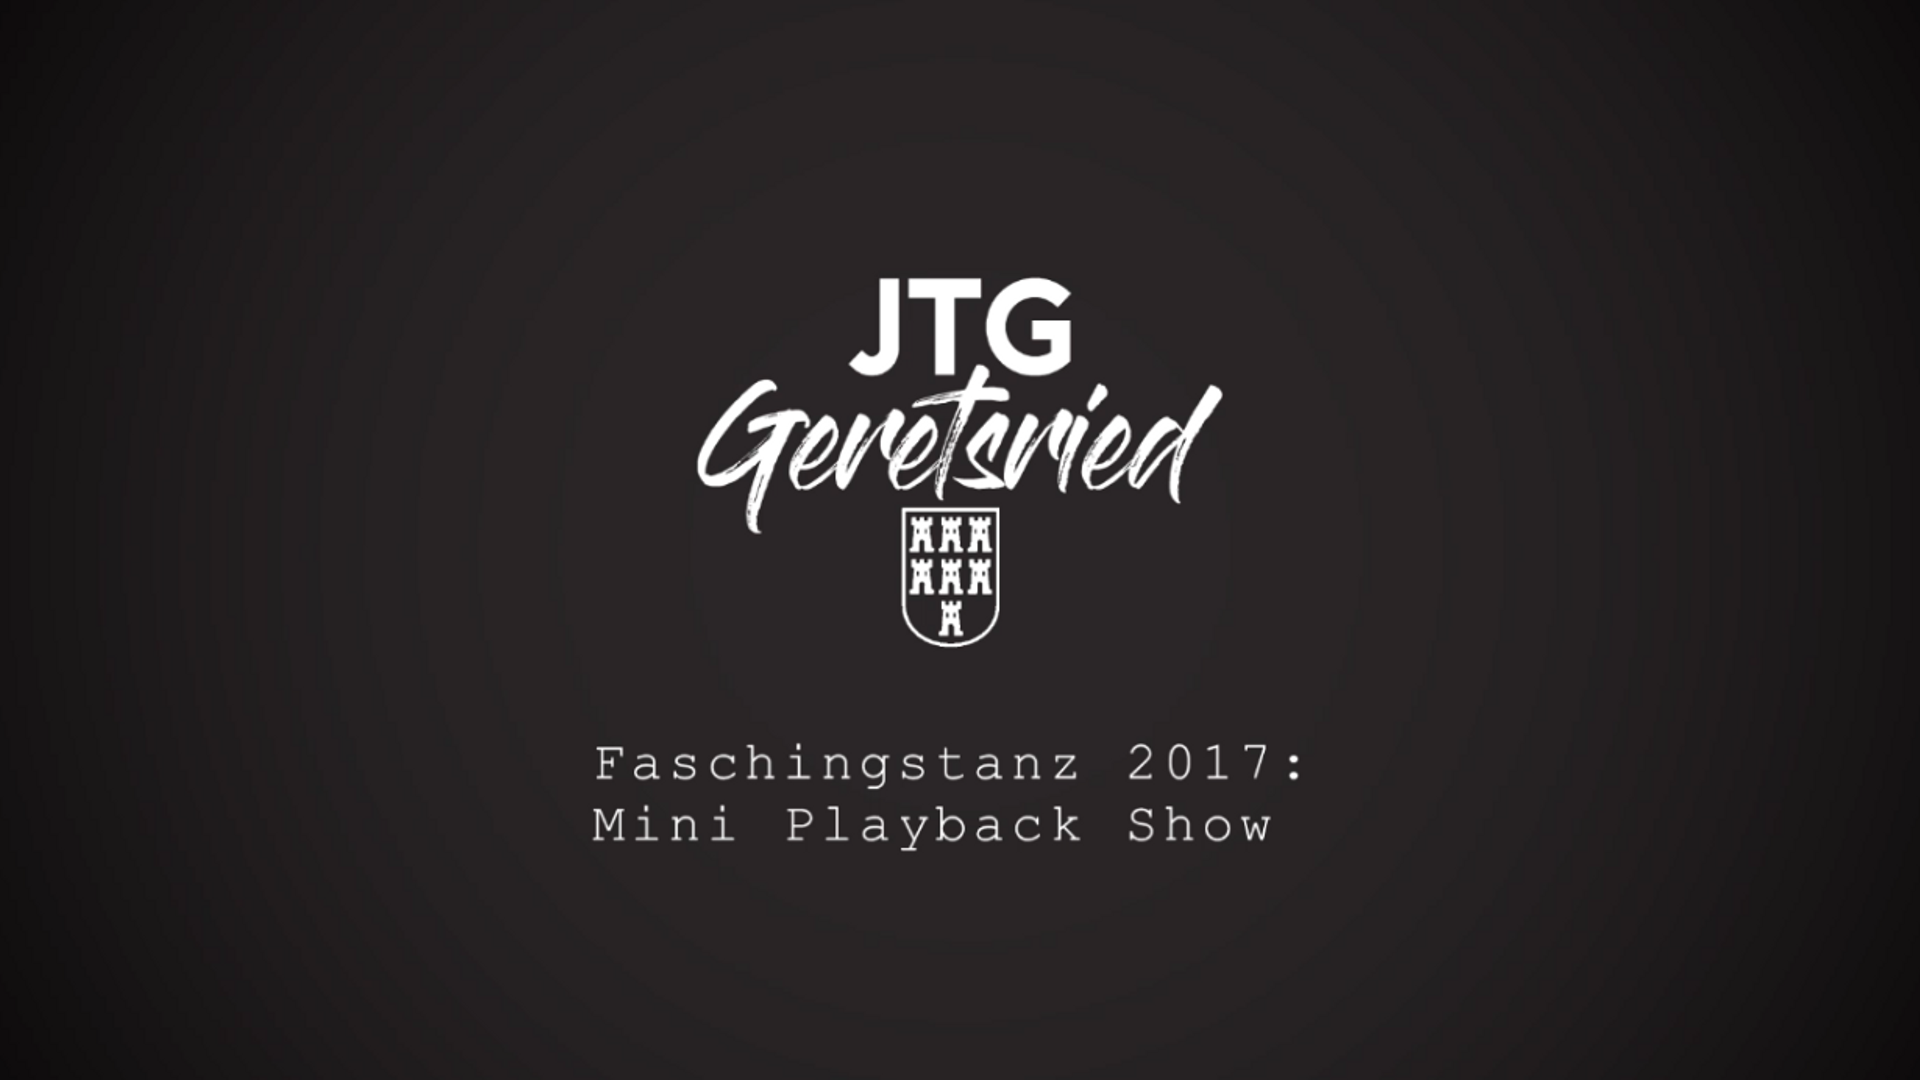 Faschingstanz 2017: Mini Playback Show